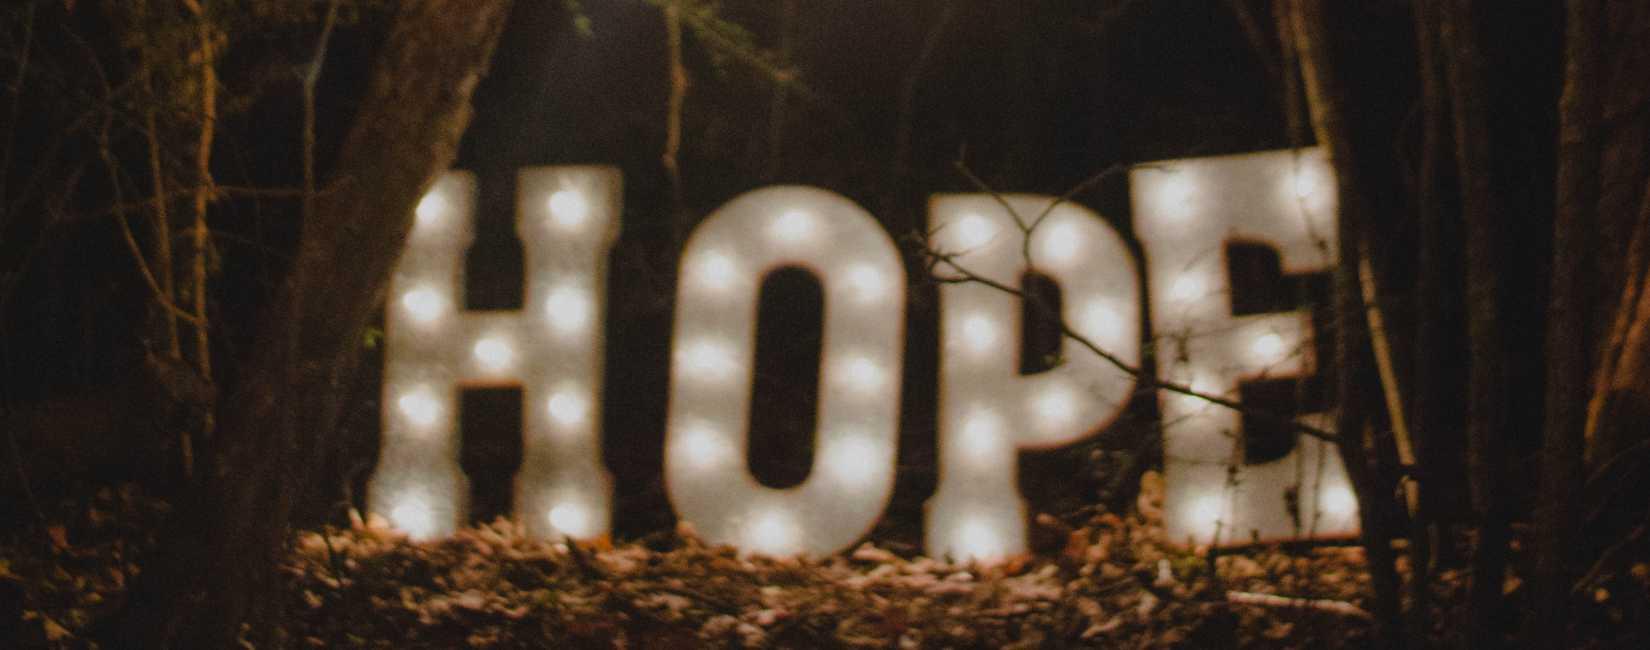 Hope - Håp